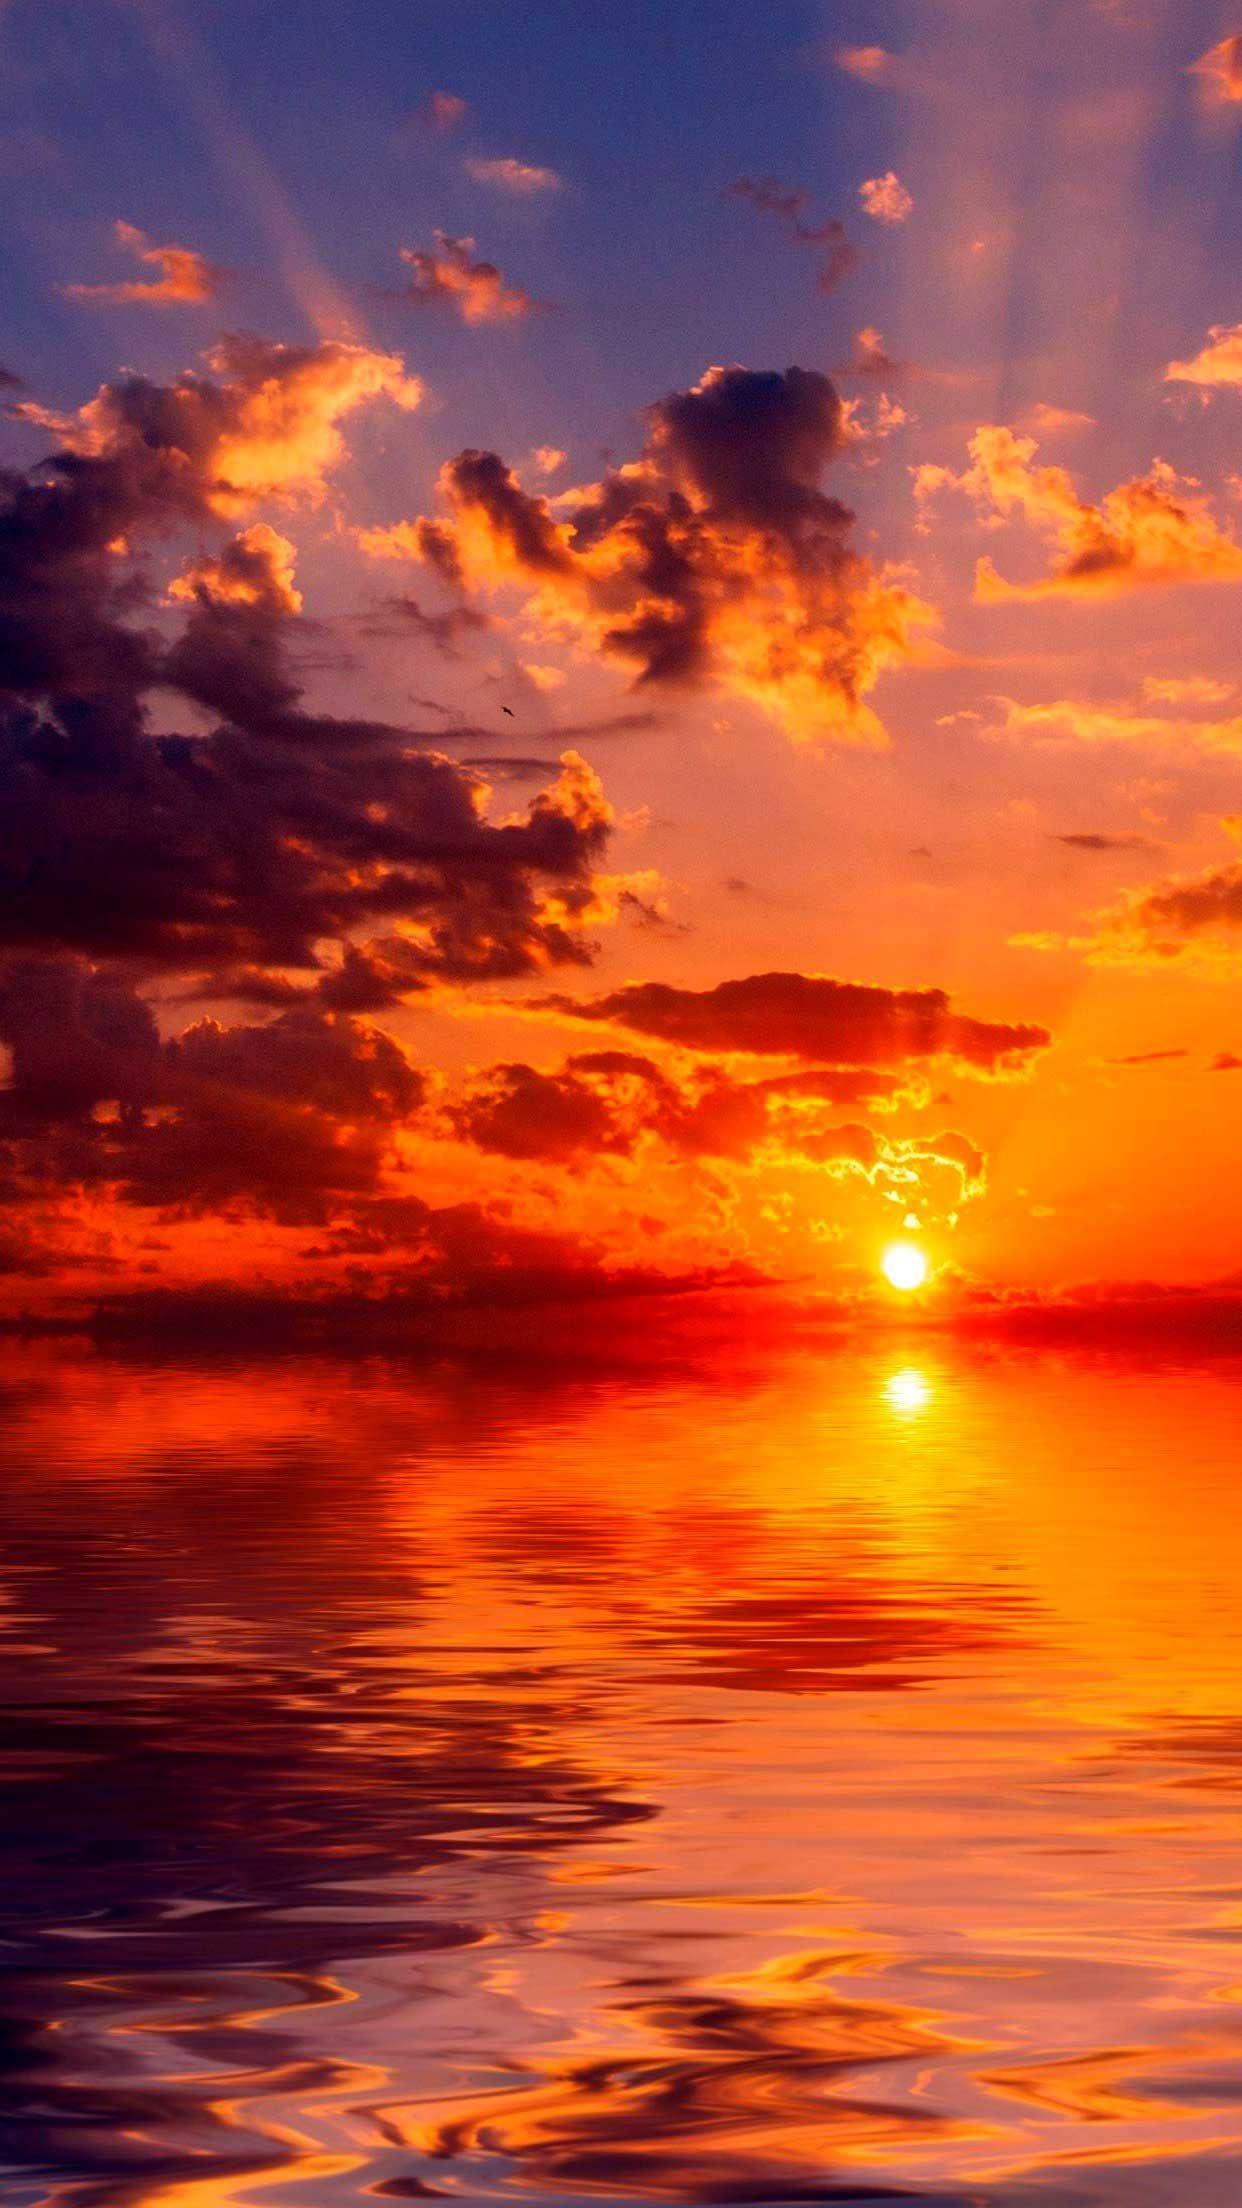 Sea Sunset Horizon Iphone Wallpapers Hd In 2020 Sunset Iphone Wallpaper Sunset Wallpaper Sunrise Wallpaper